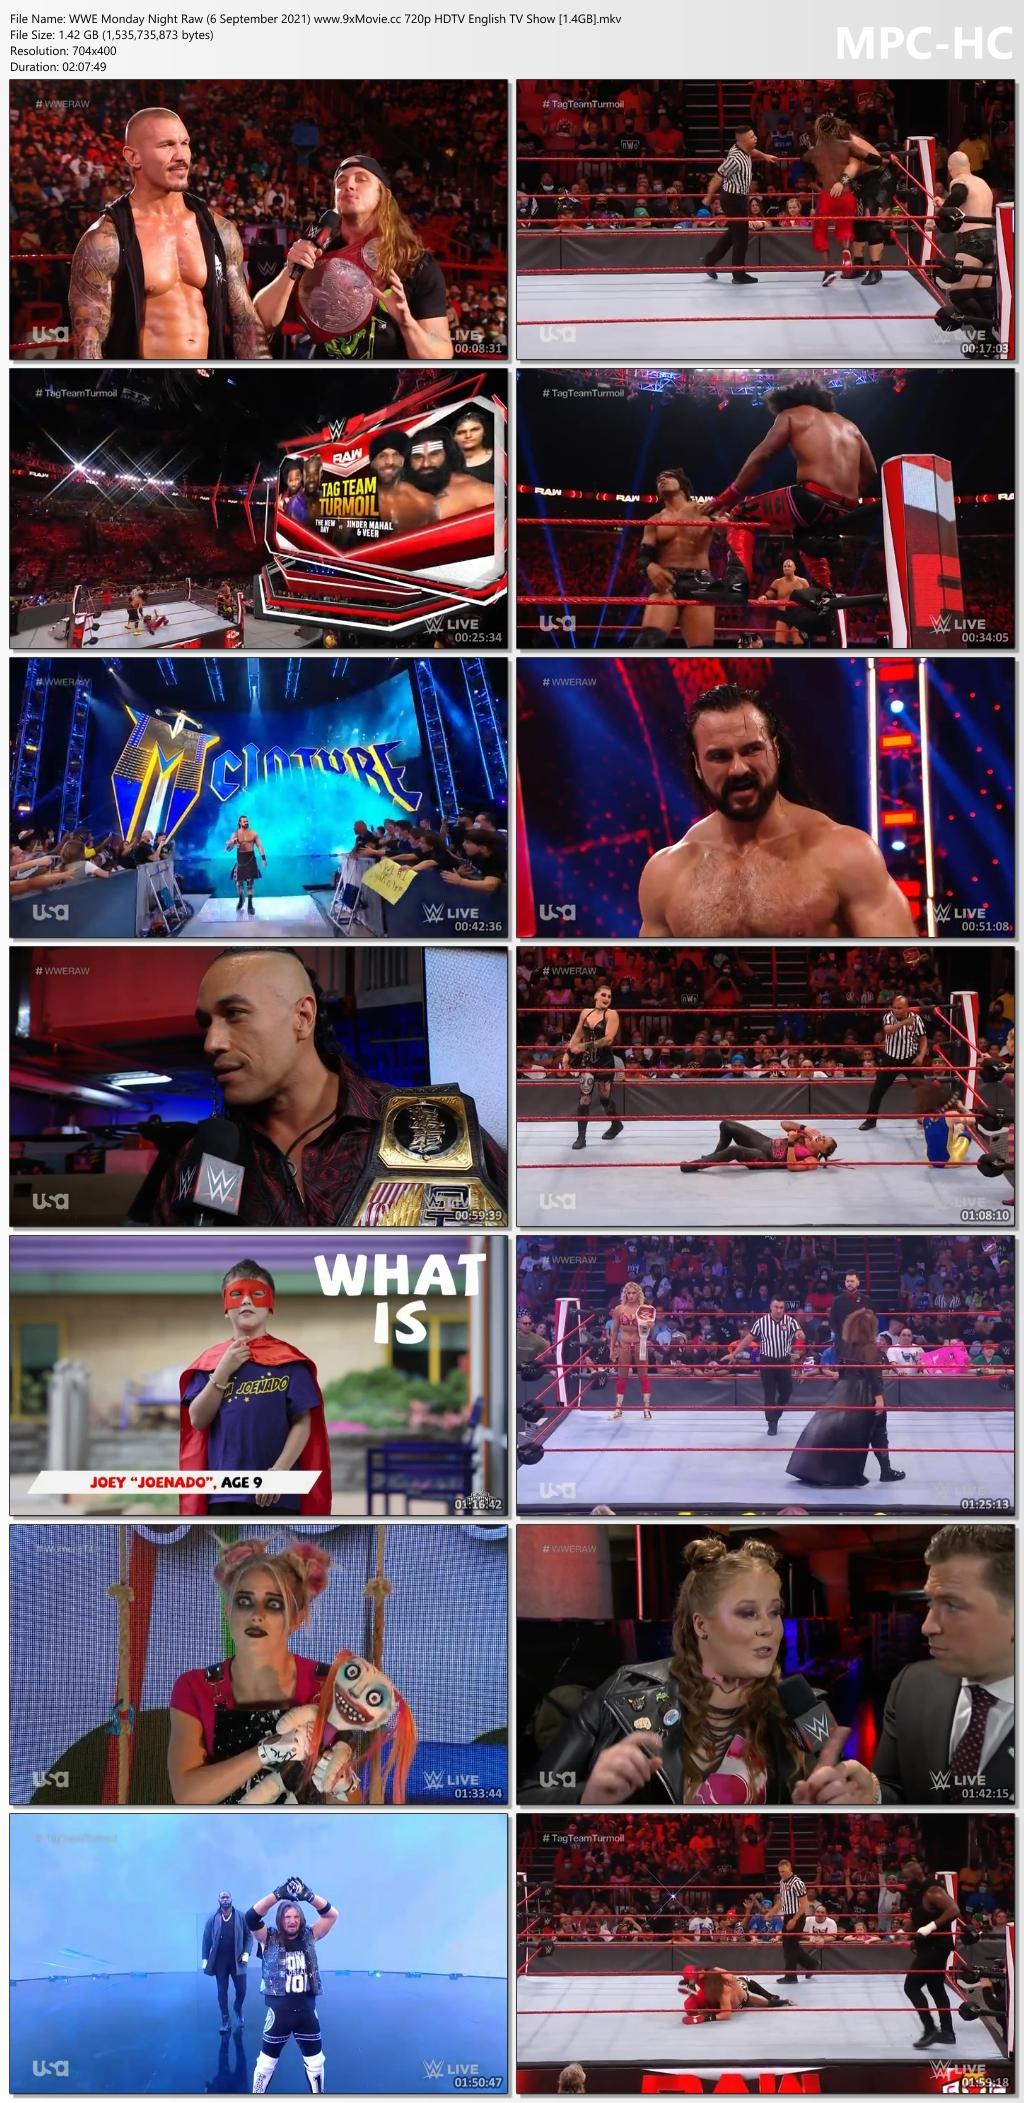 WWE-Monday-Night-Raw-6-September-2021-www-9x-Movie-cc-720p-HDTV-English-TV-Show-1-4-GB-mkv